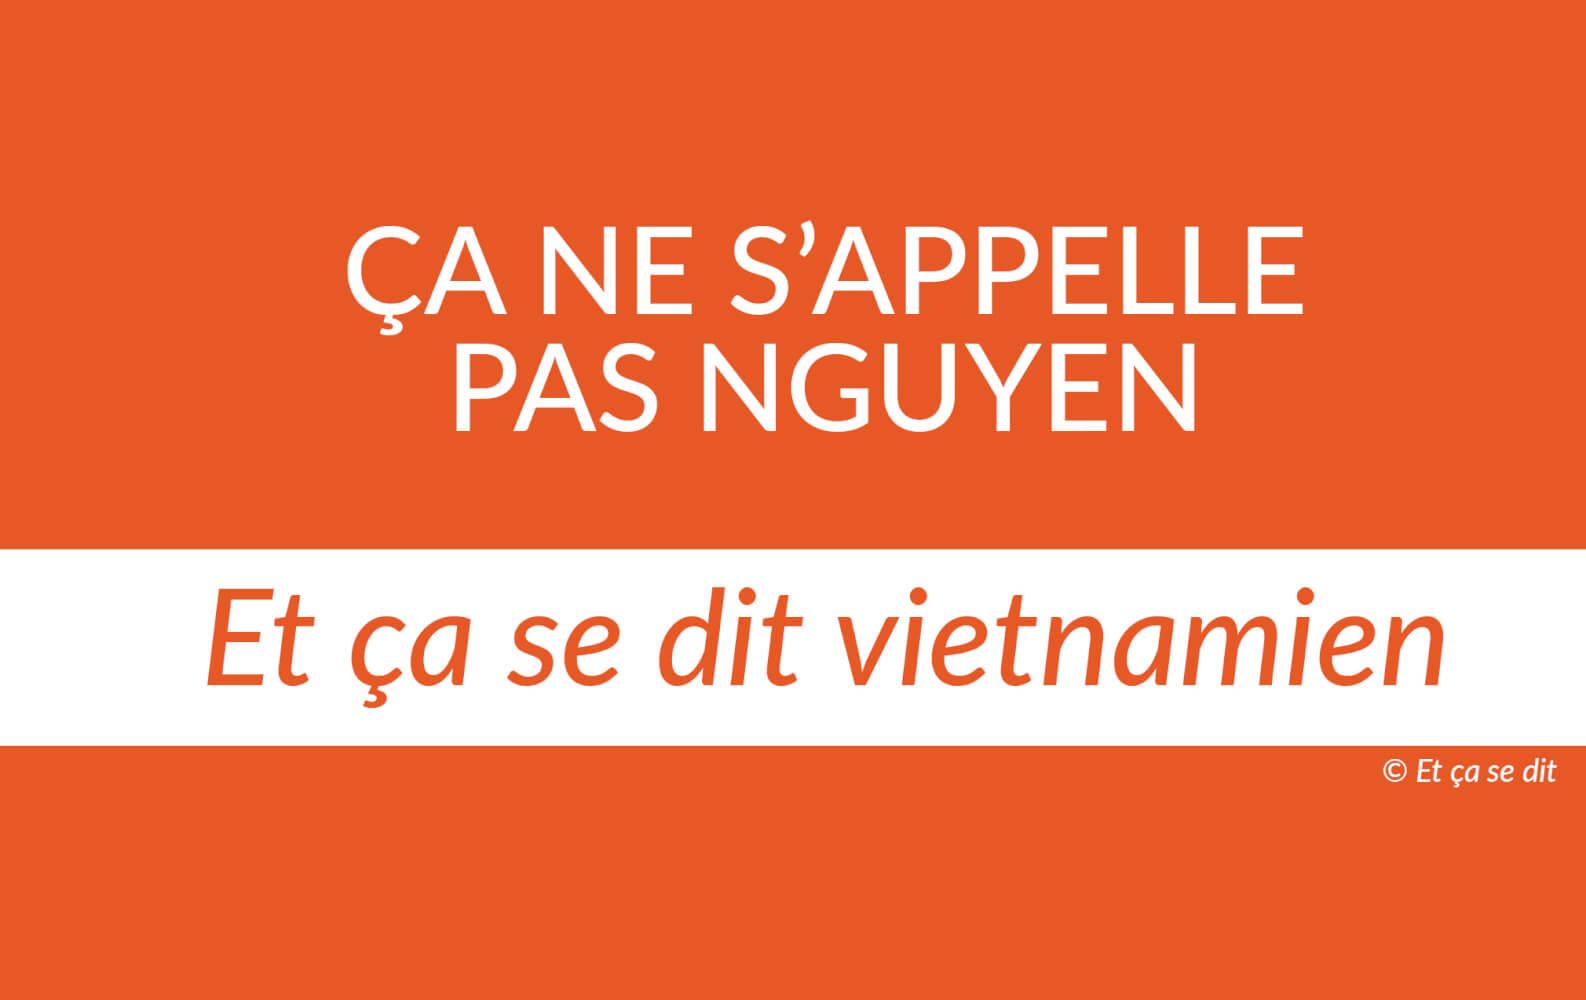 famille nguyen nom vietnam